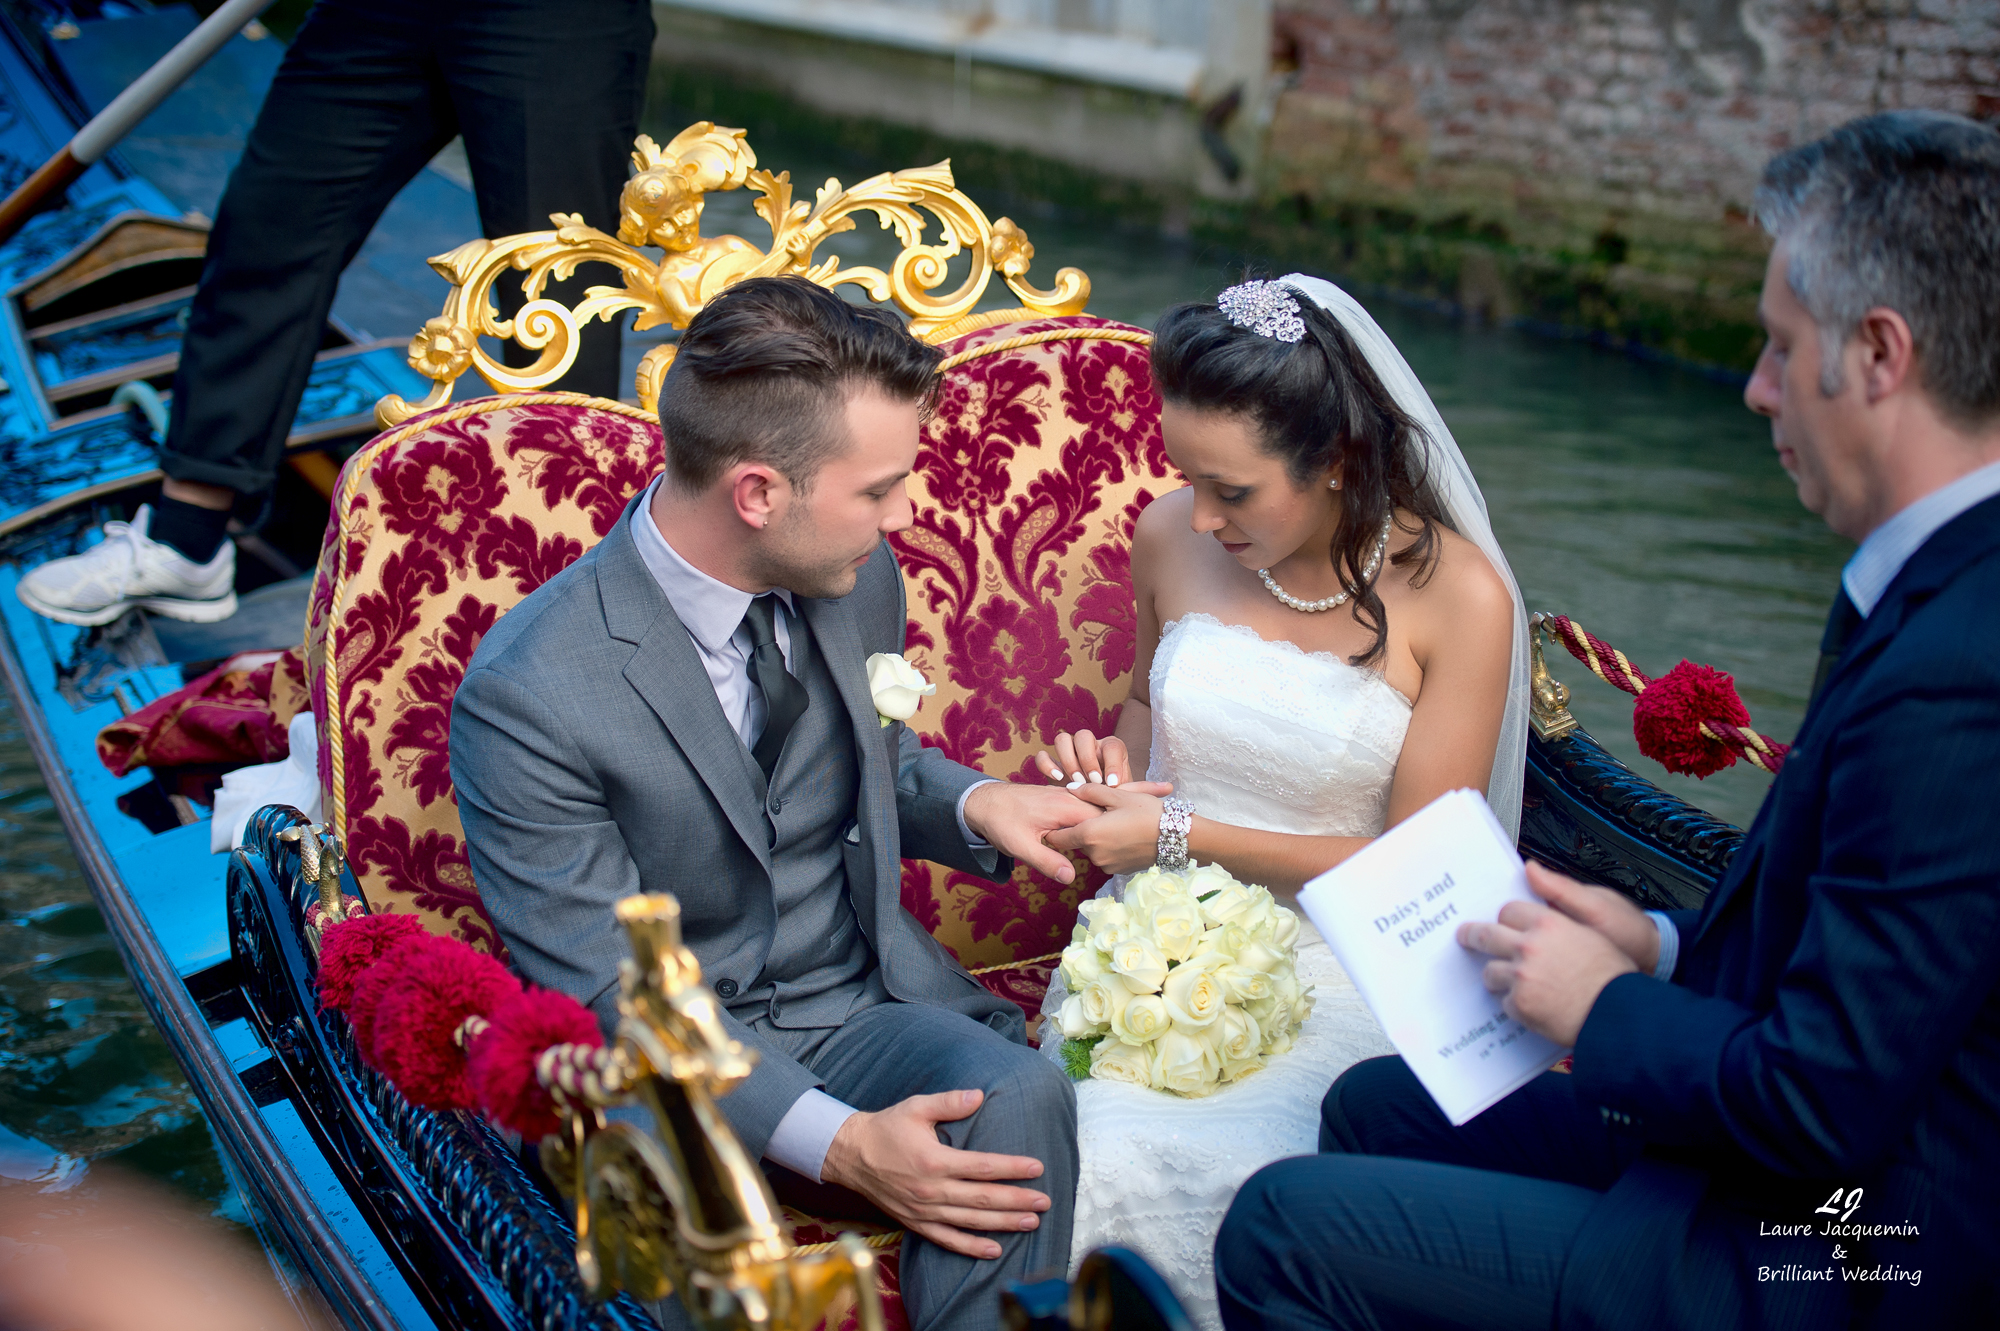 Venice Simbolic Wedding gondola venice Italy laure jacquemin photography (40) copia